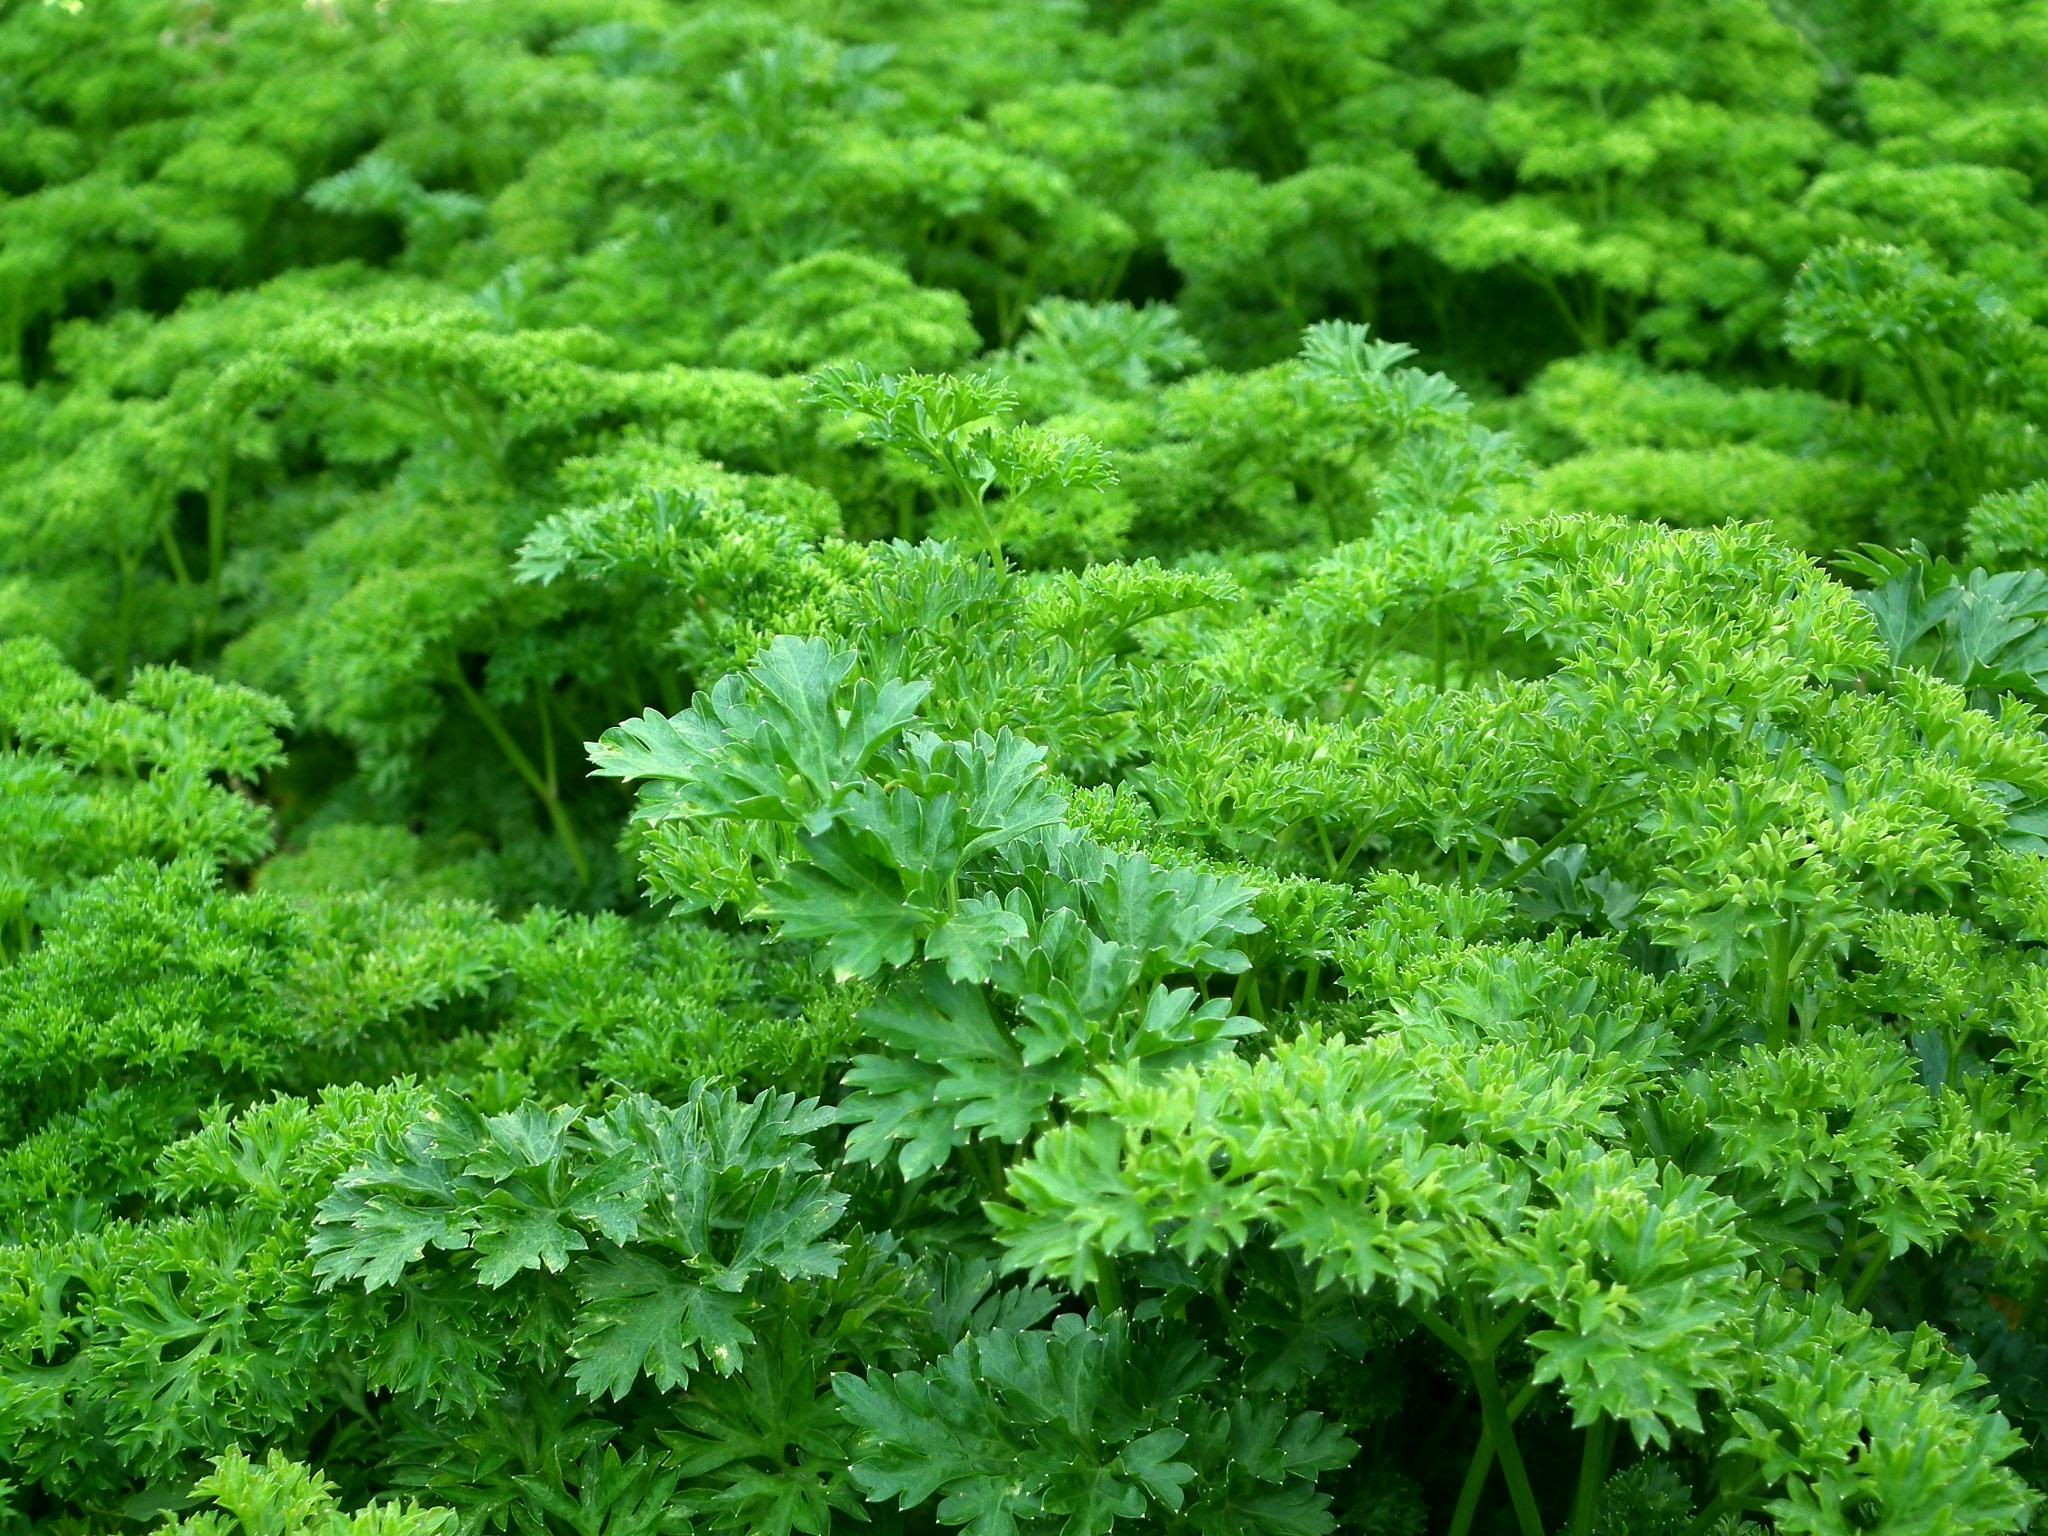 Parsley plants